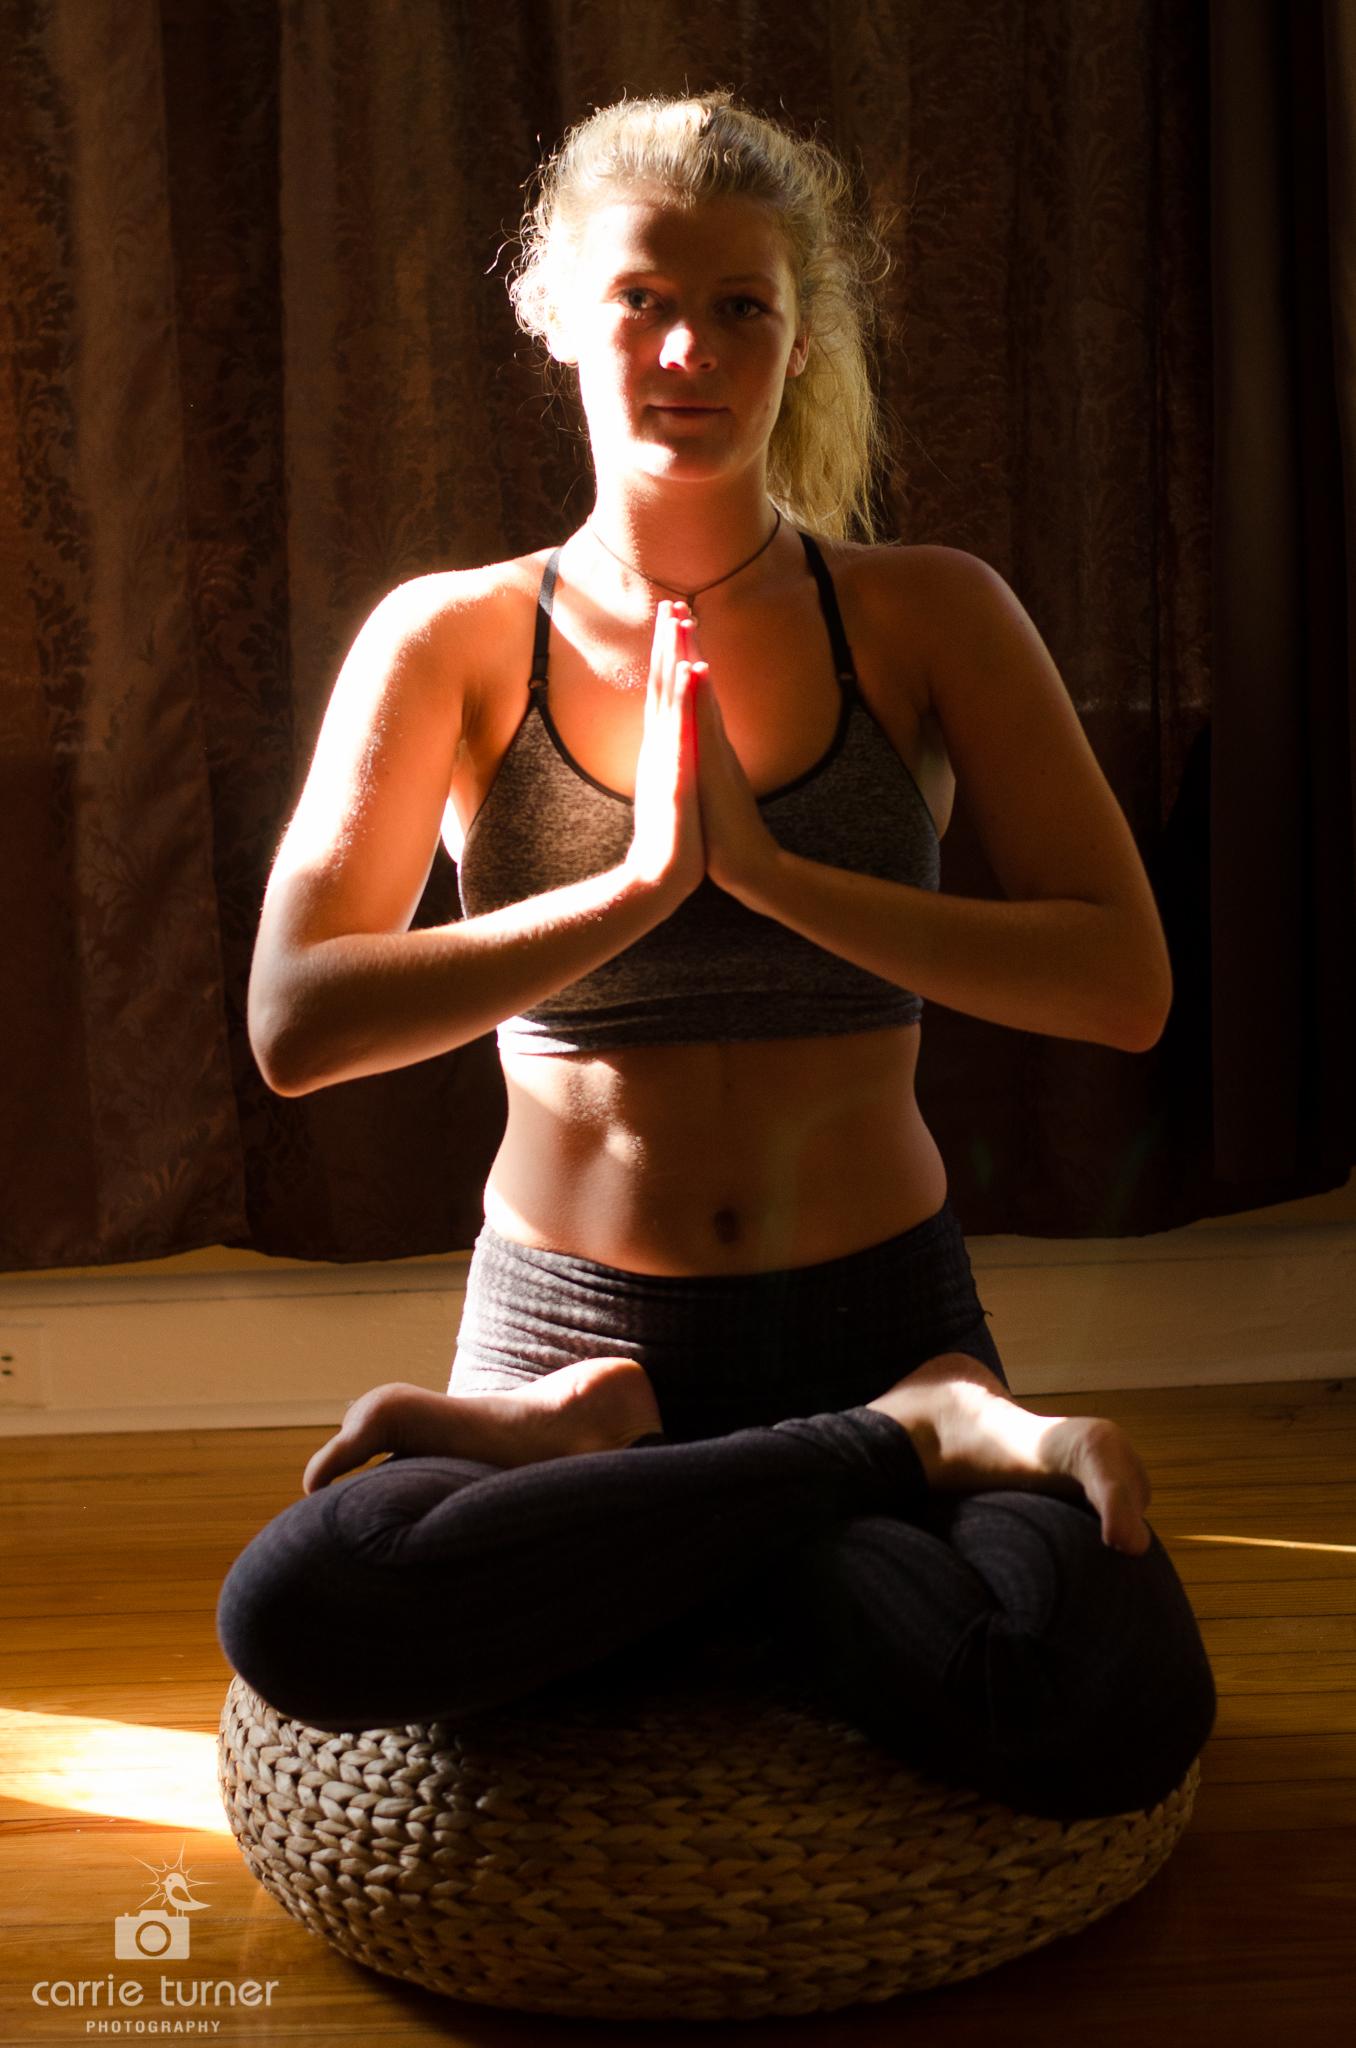 Maggie_yoga and portraits-92.jpg